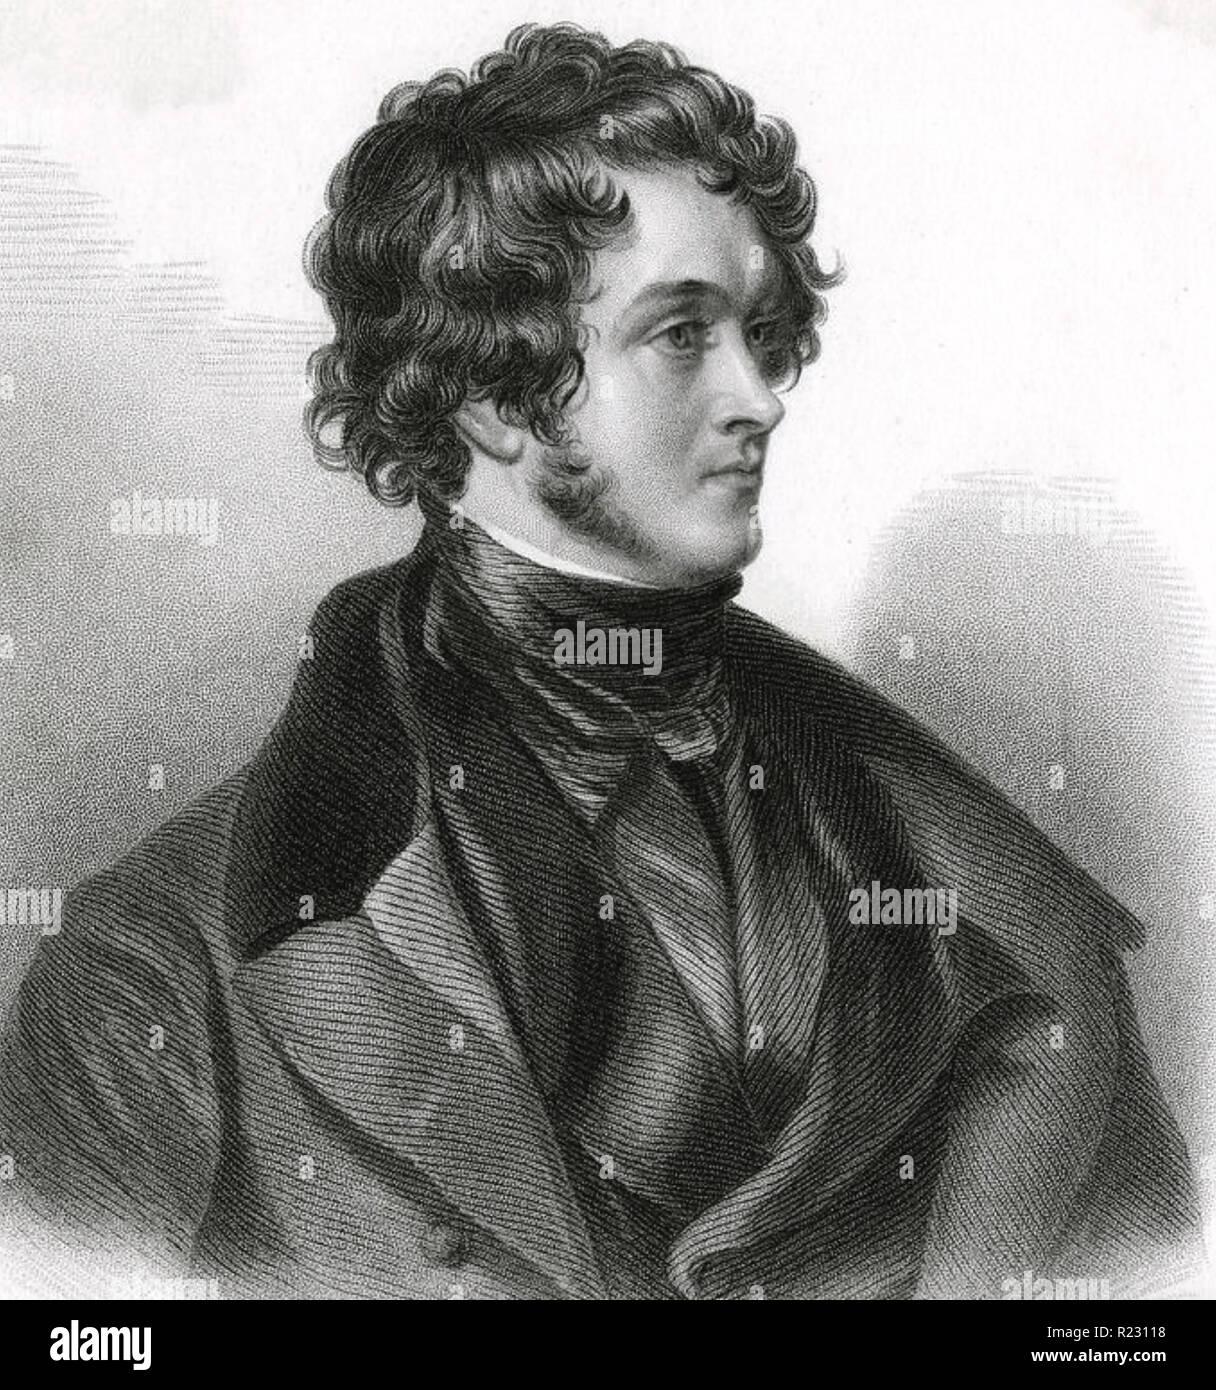 WILLIAM AINSWORTH (1805-1882) Inglés novelista histórico Imagen De Stock